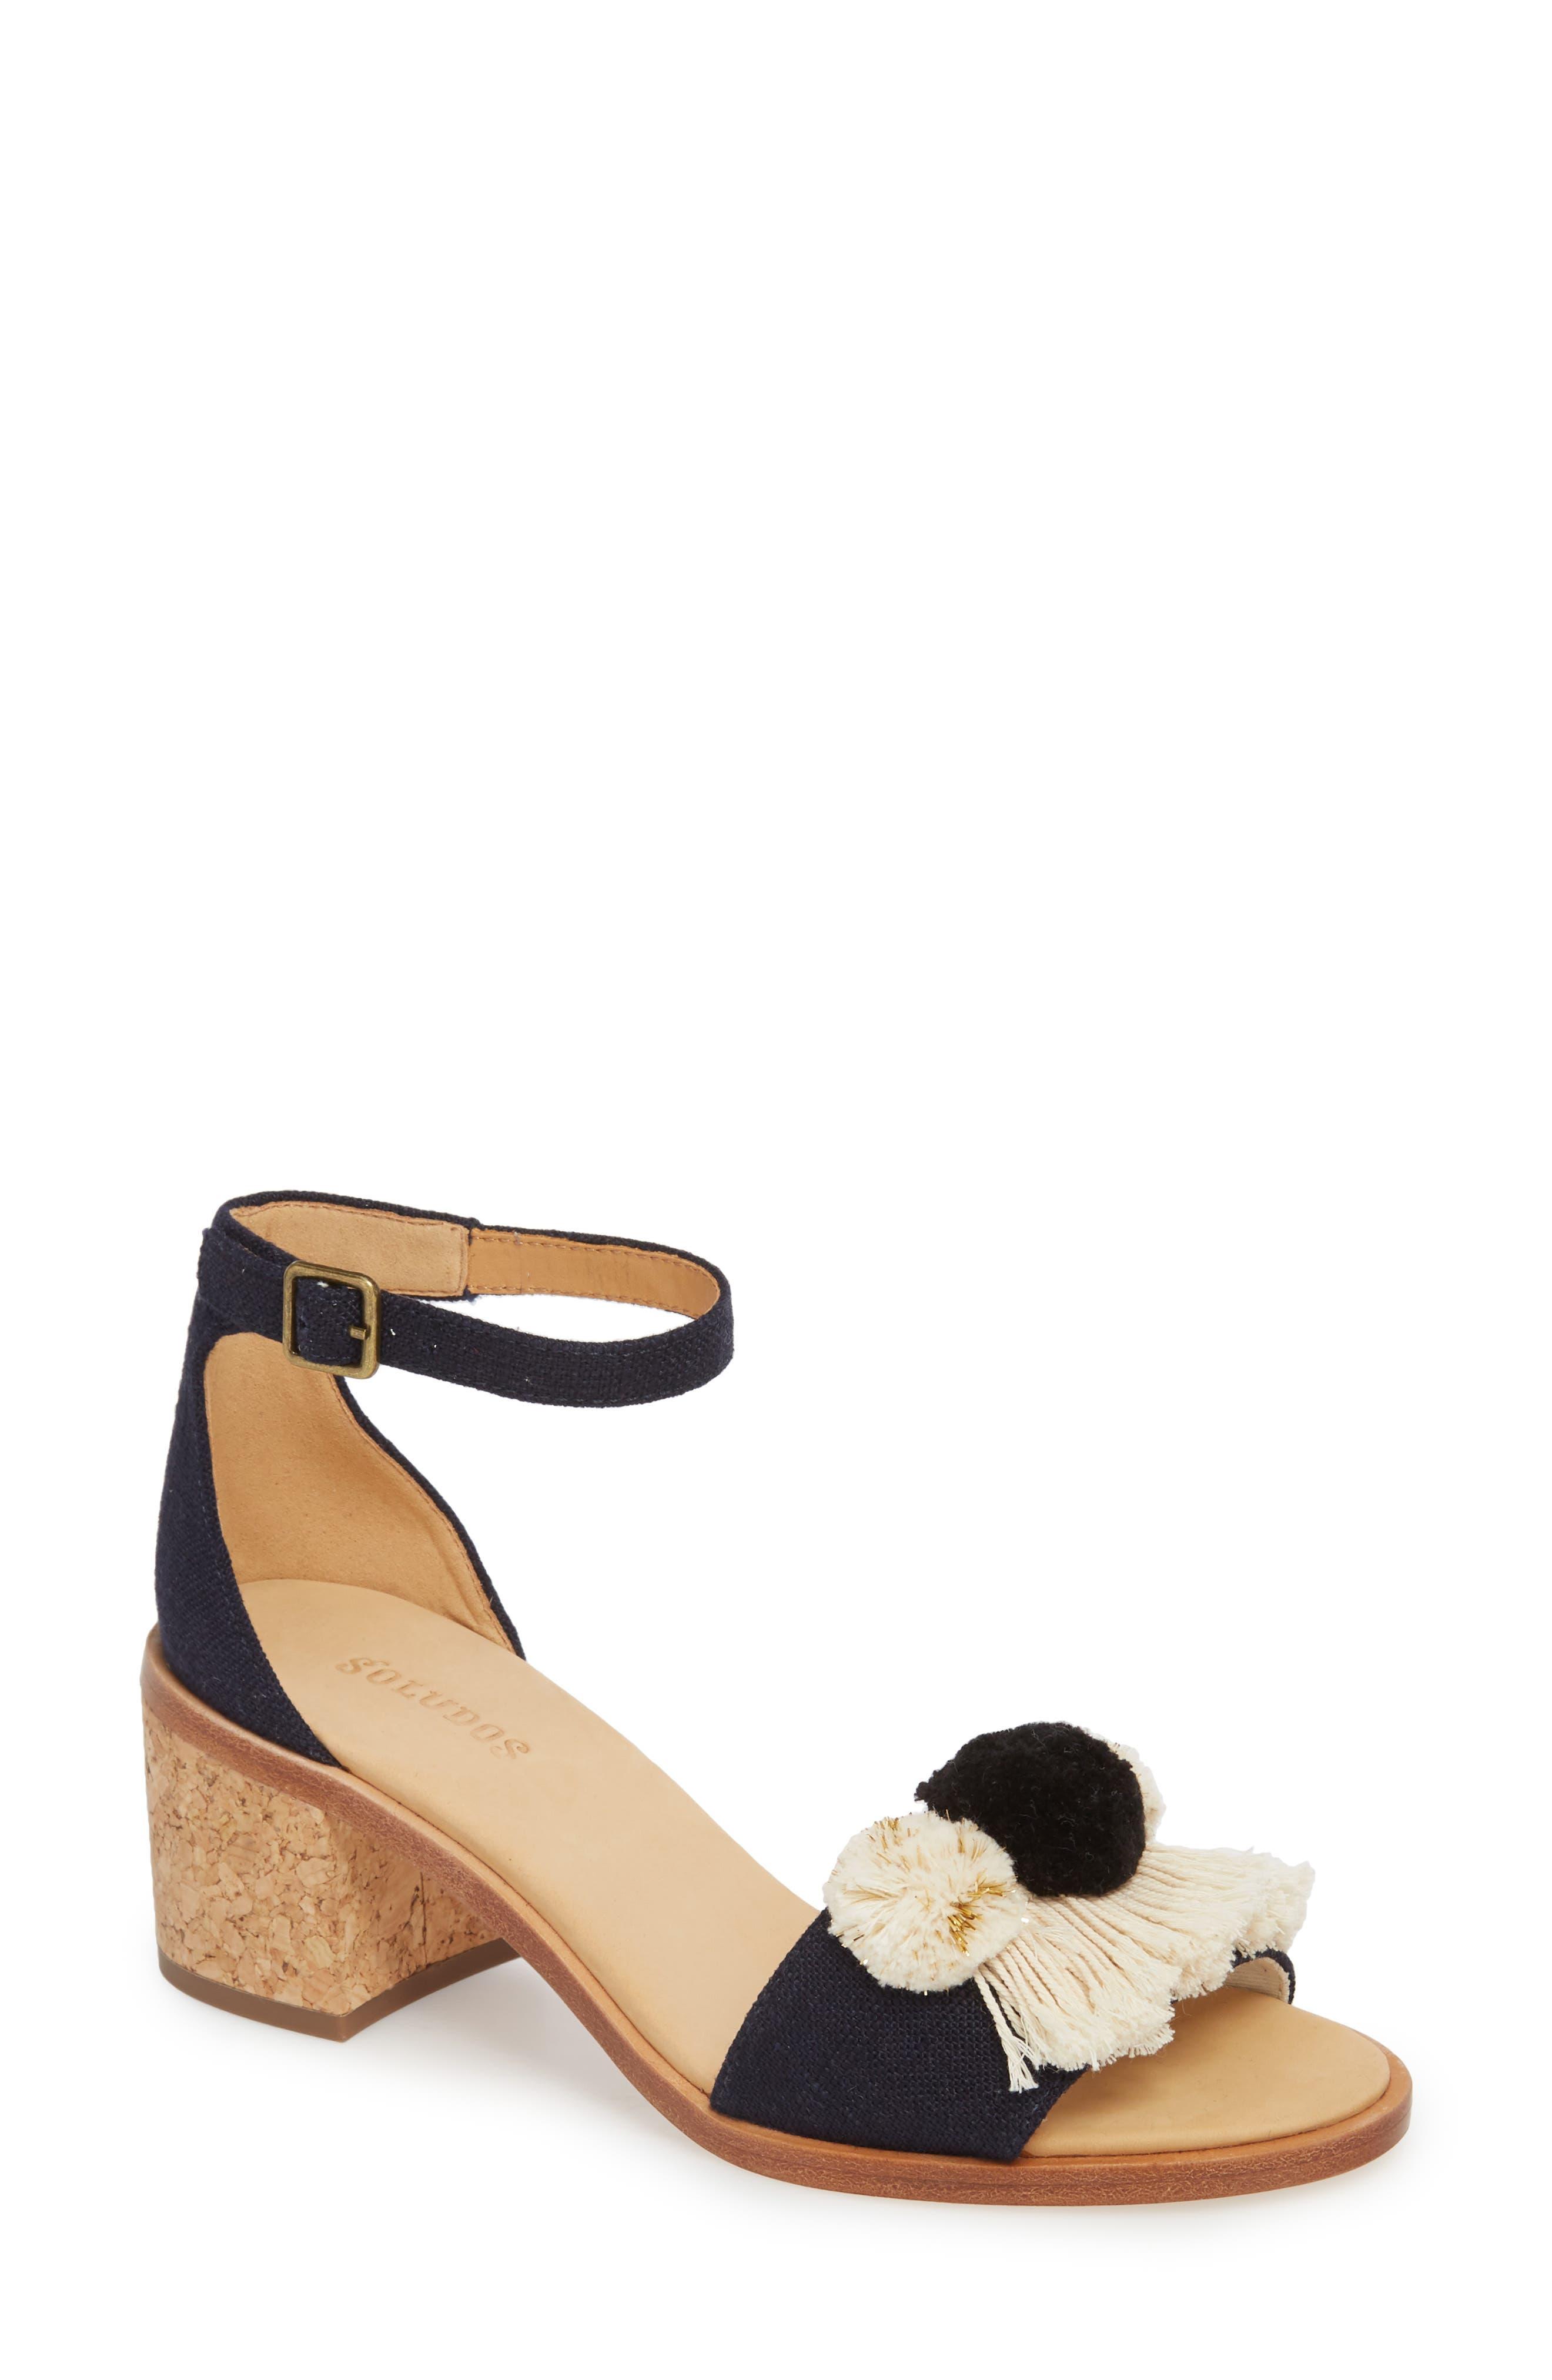 Capri Pom Pom Heel Sandal,                             Main thumbnail 1, color,                             Eclipse